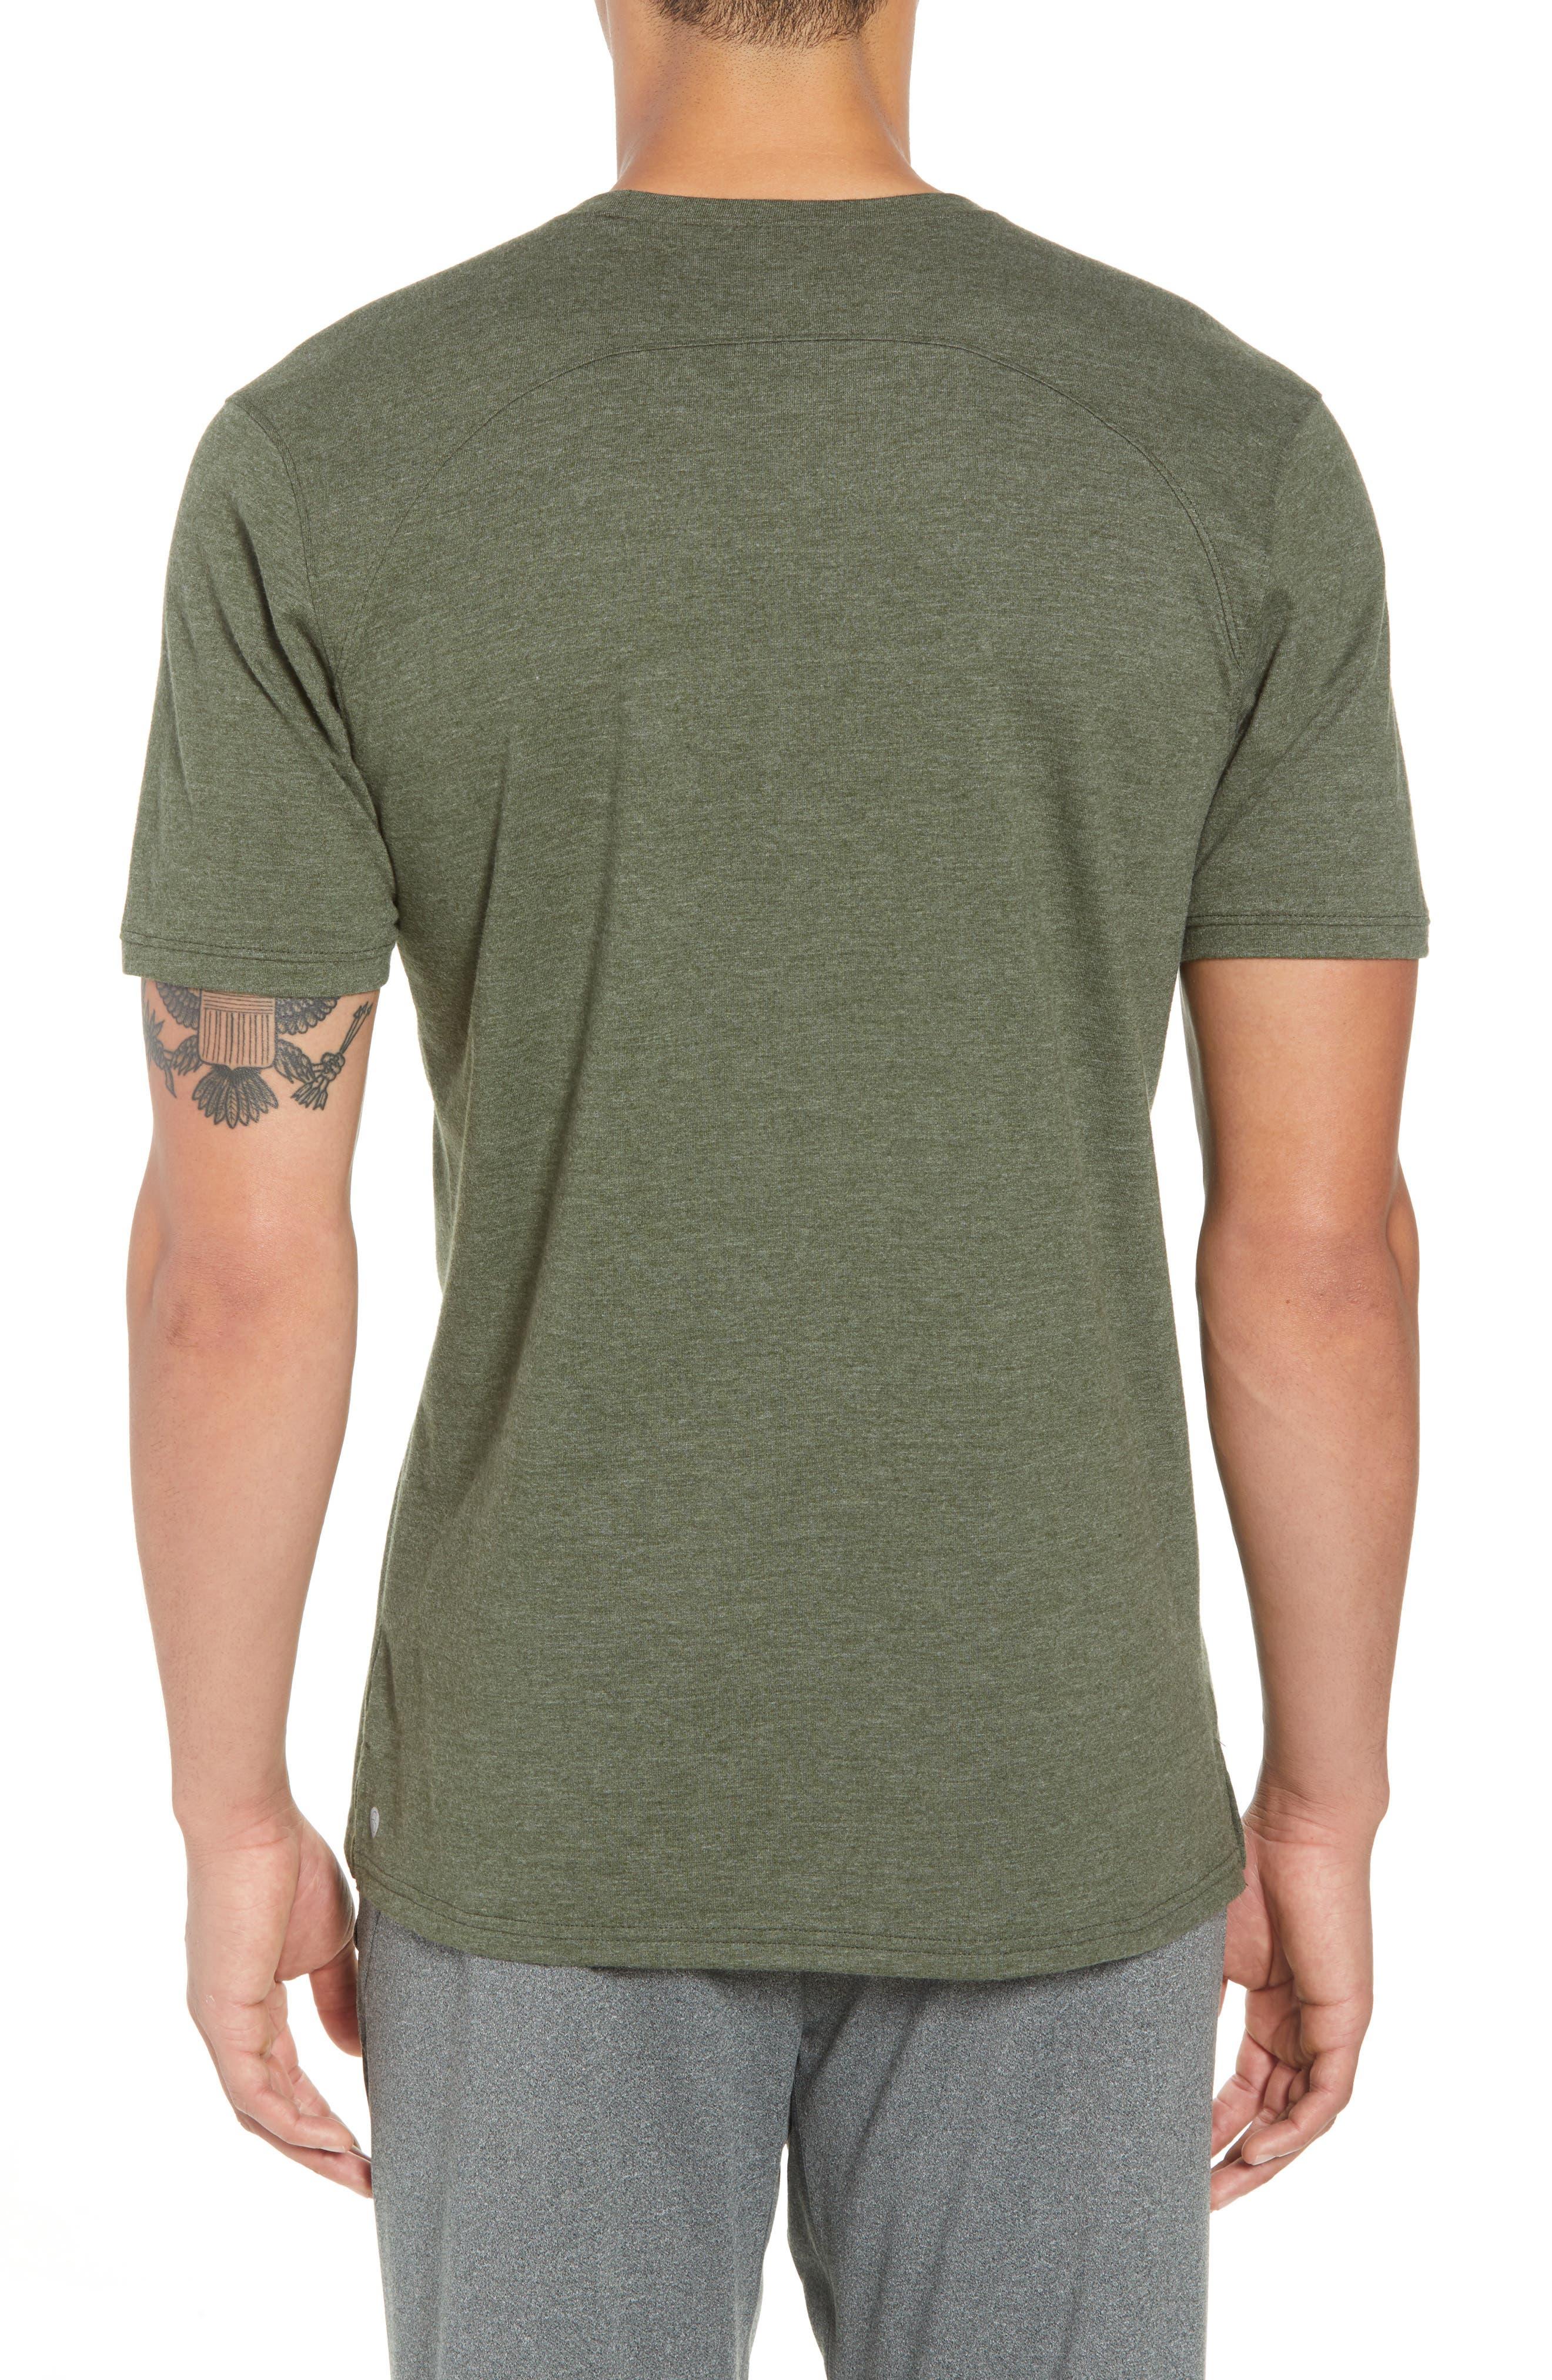 Perfomance T-Shirt,                             Alternate thumbnail 2, color,                             GREEN TACTICAL MELANGE